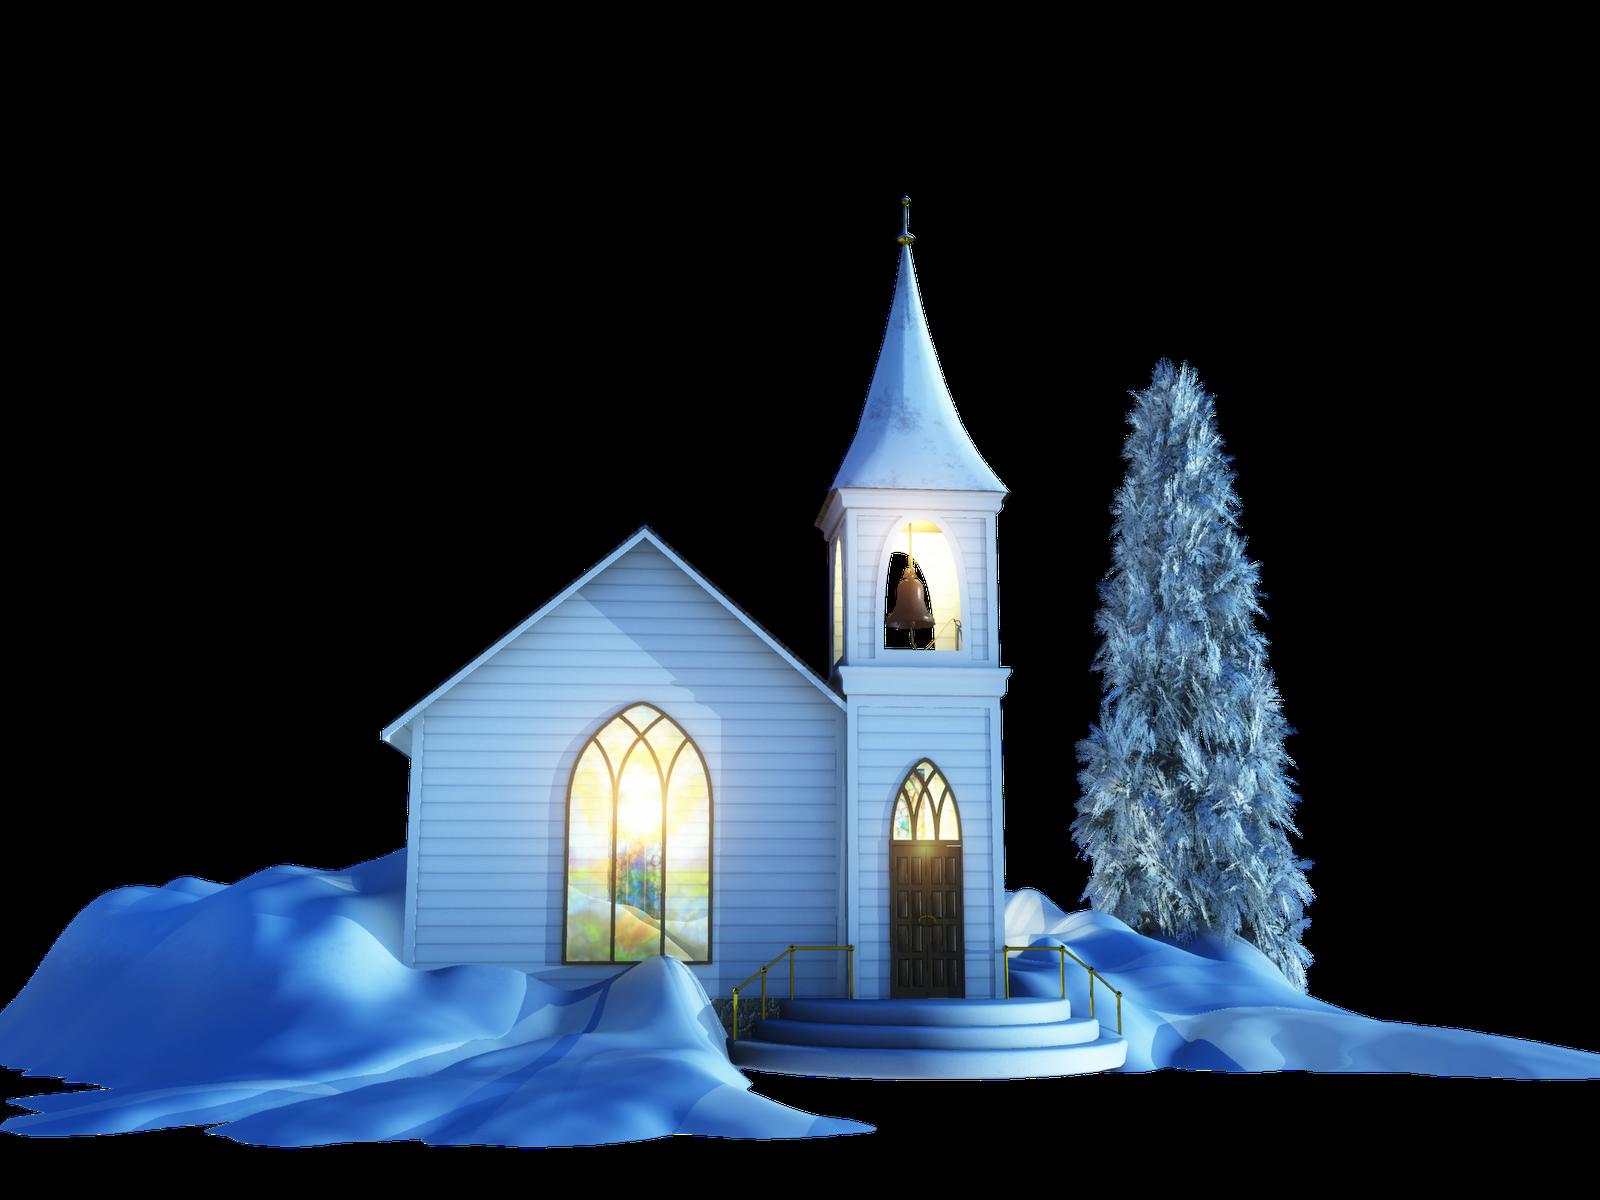 Winter clipart church, Winter church Transparent FREE for.